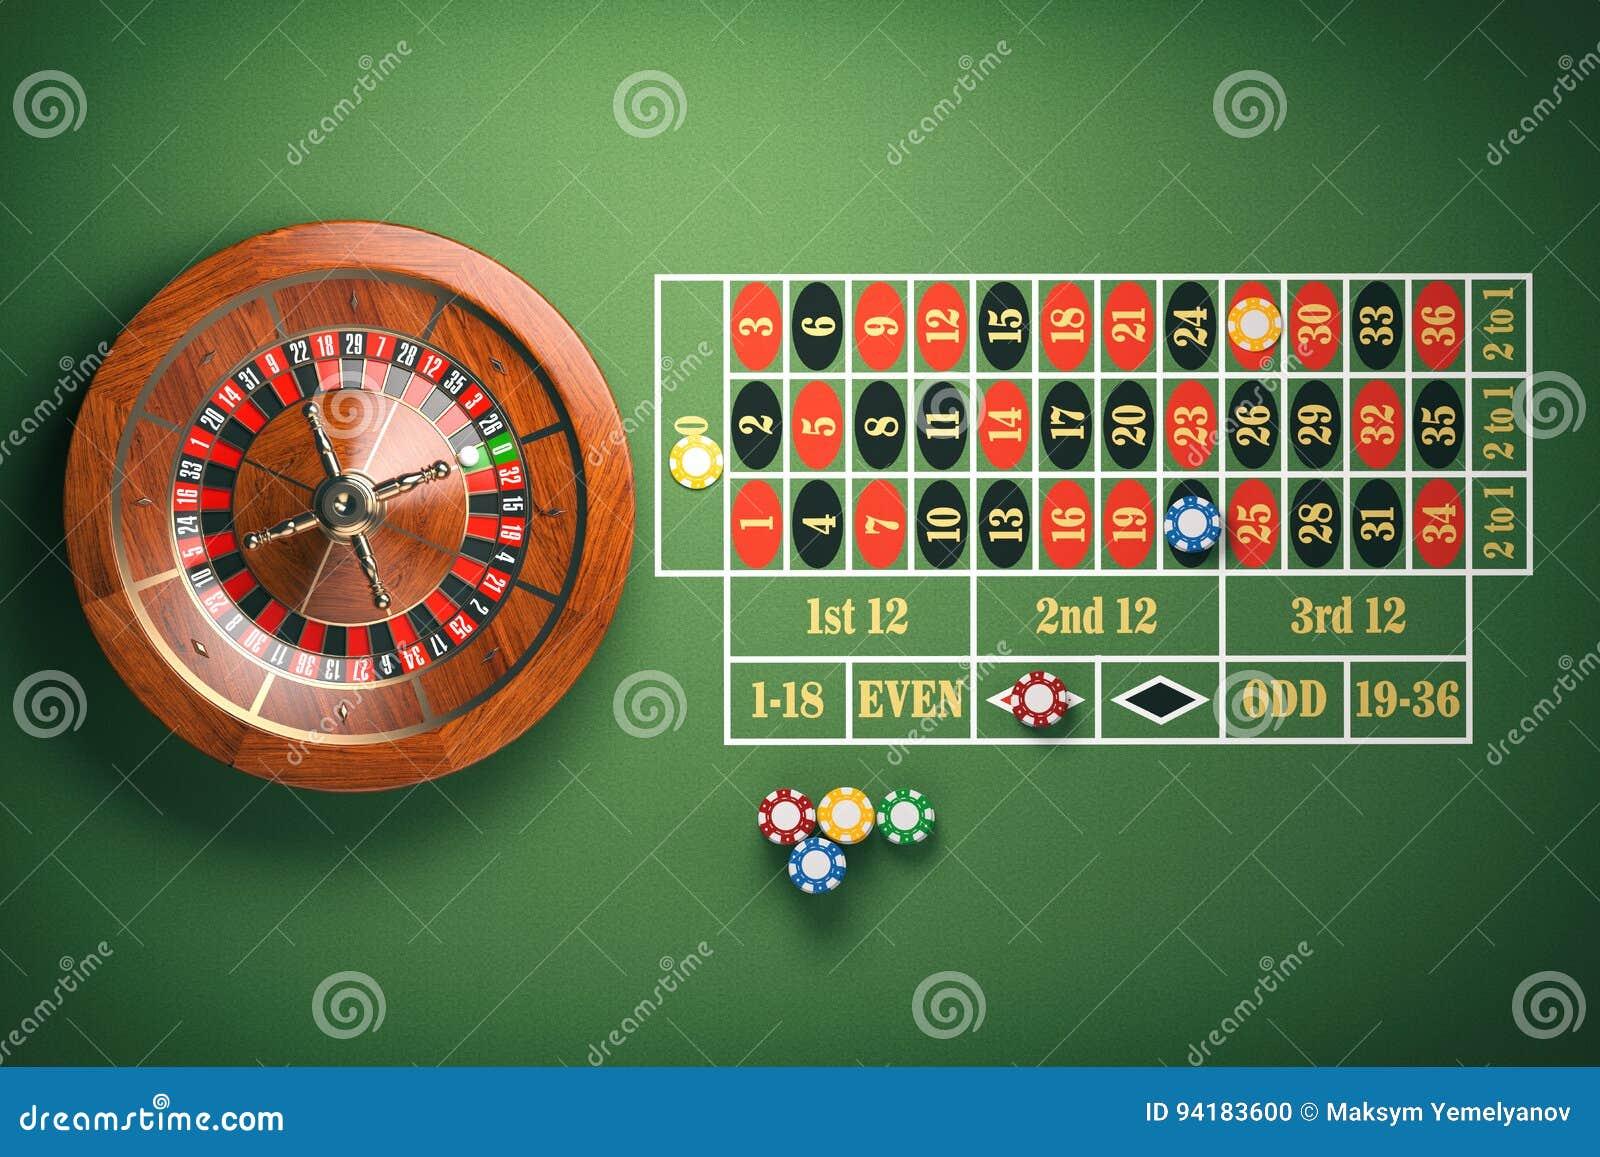 Lucky247 roulette auszahlungen 00161 fehler